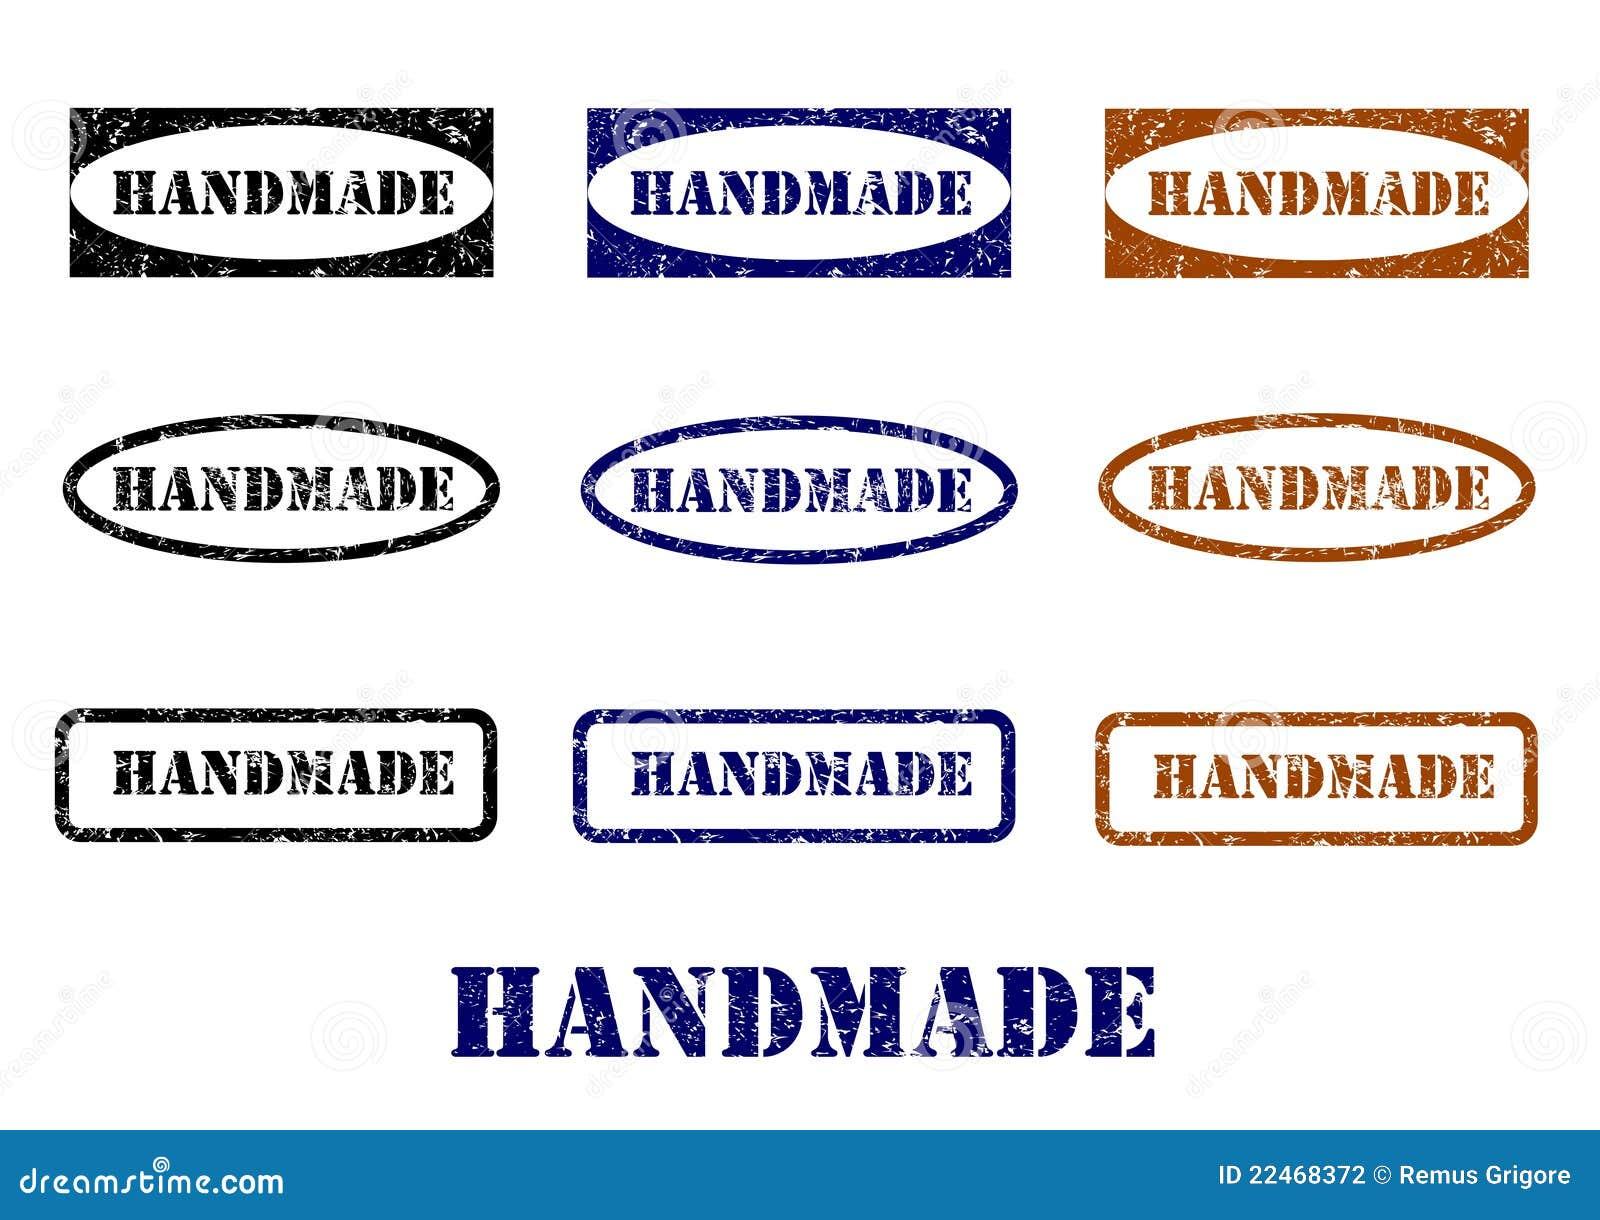 Handmade Stamps - Cdr Format Stock Vector - Illustration of